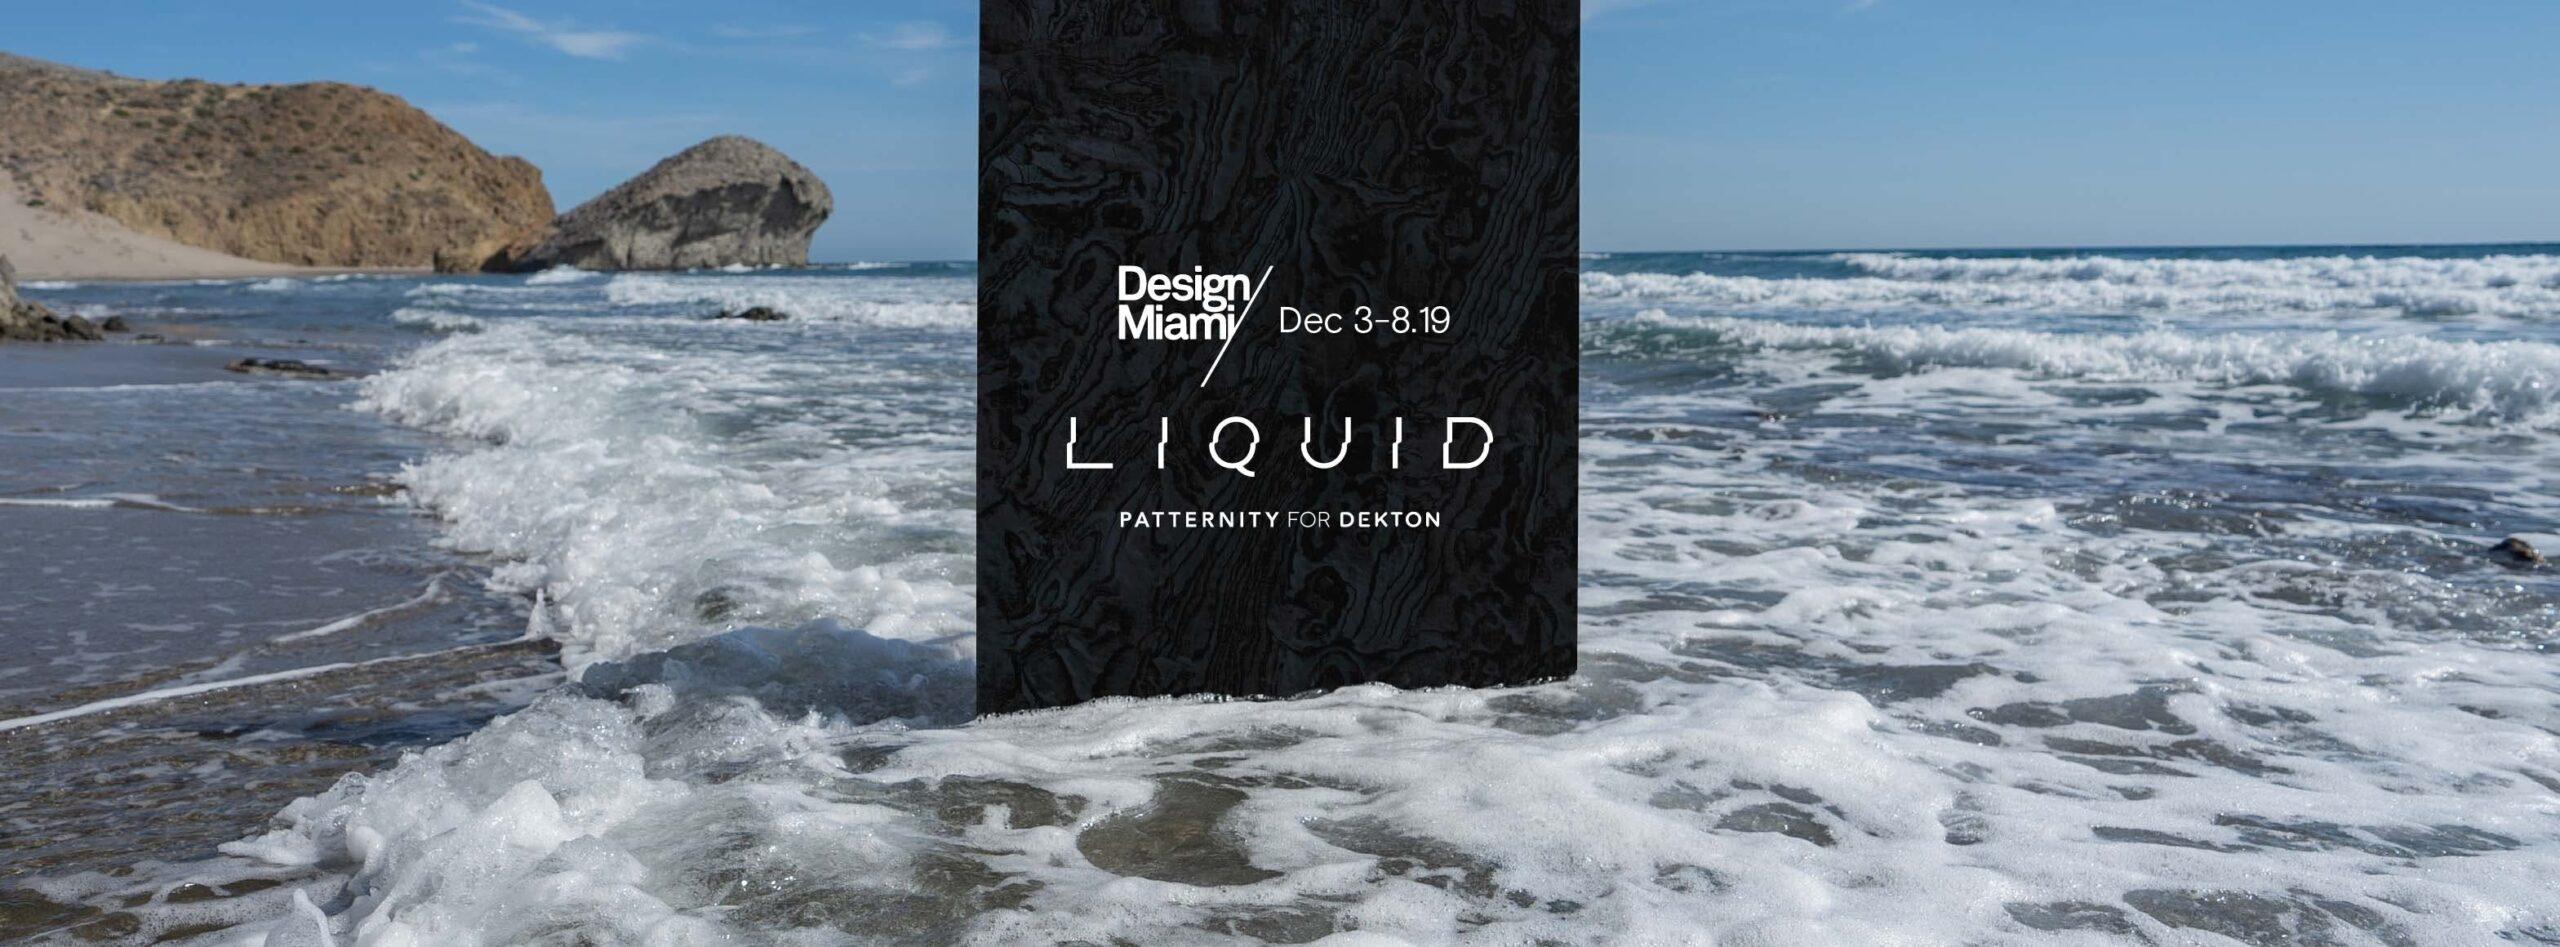 Image of Liquid Miami 1 2 scaled in Cosentino returns to Miami Design Week 2019 - Cosentino